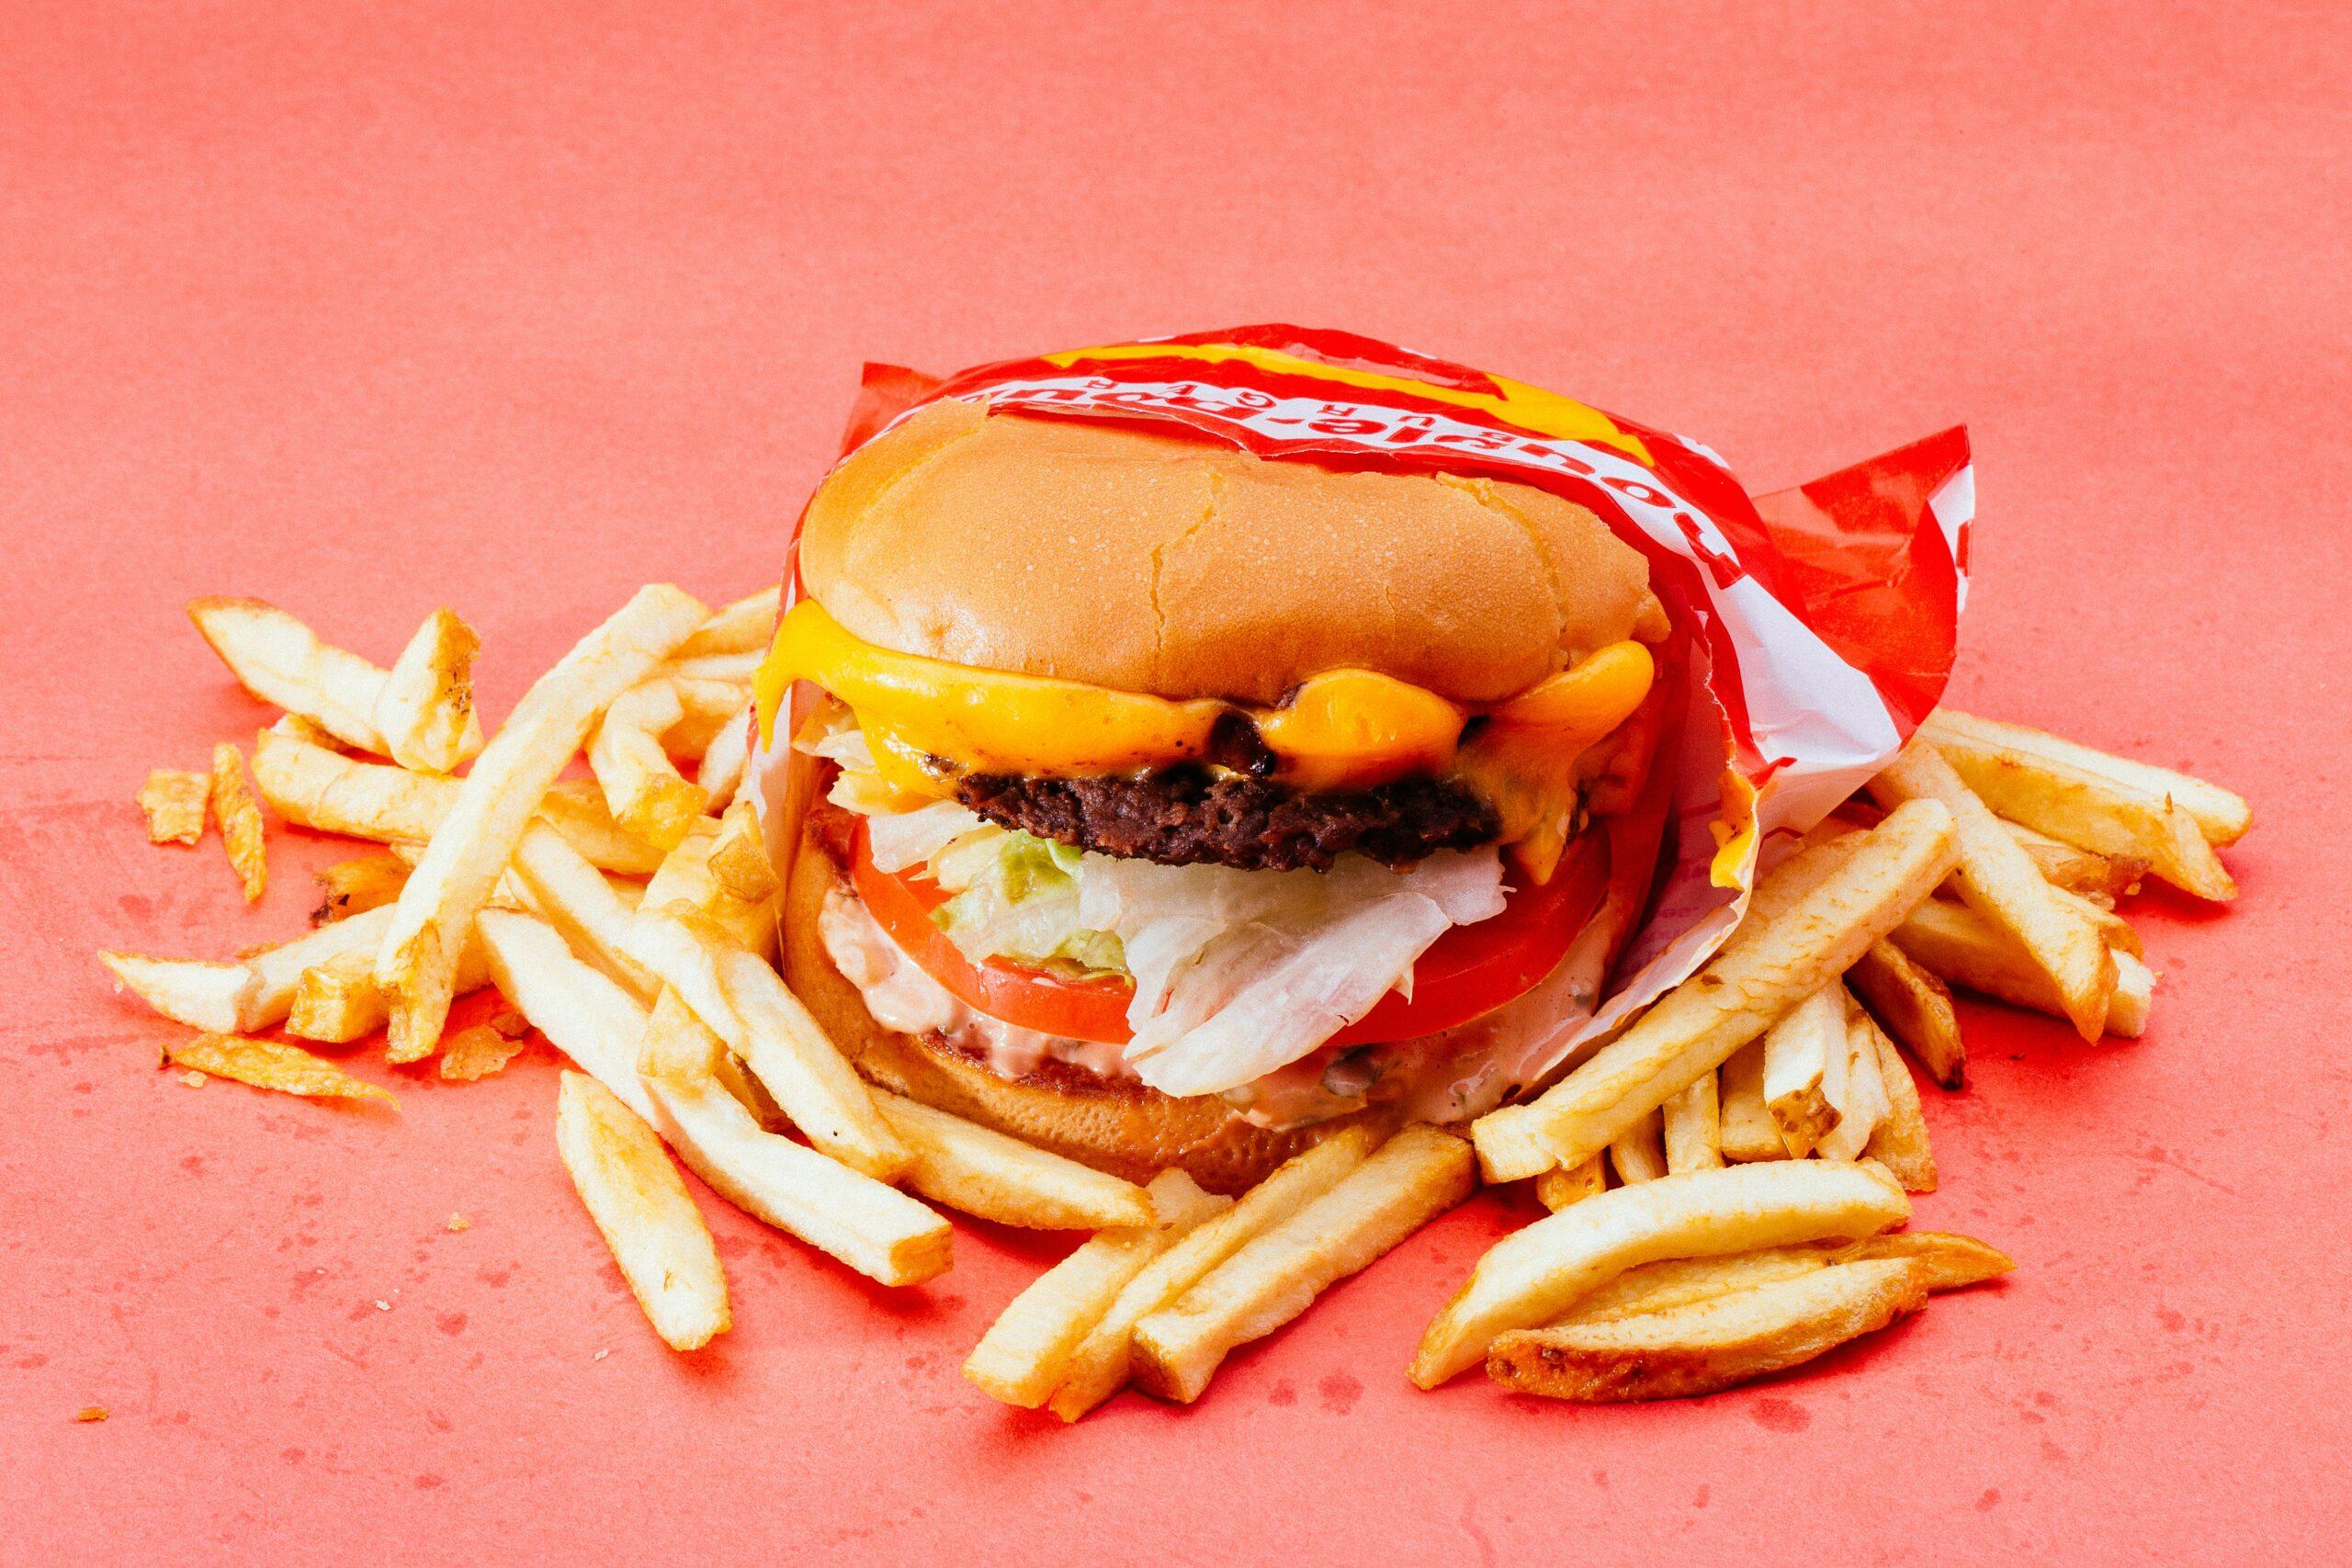 Cheeseburger Tester Job